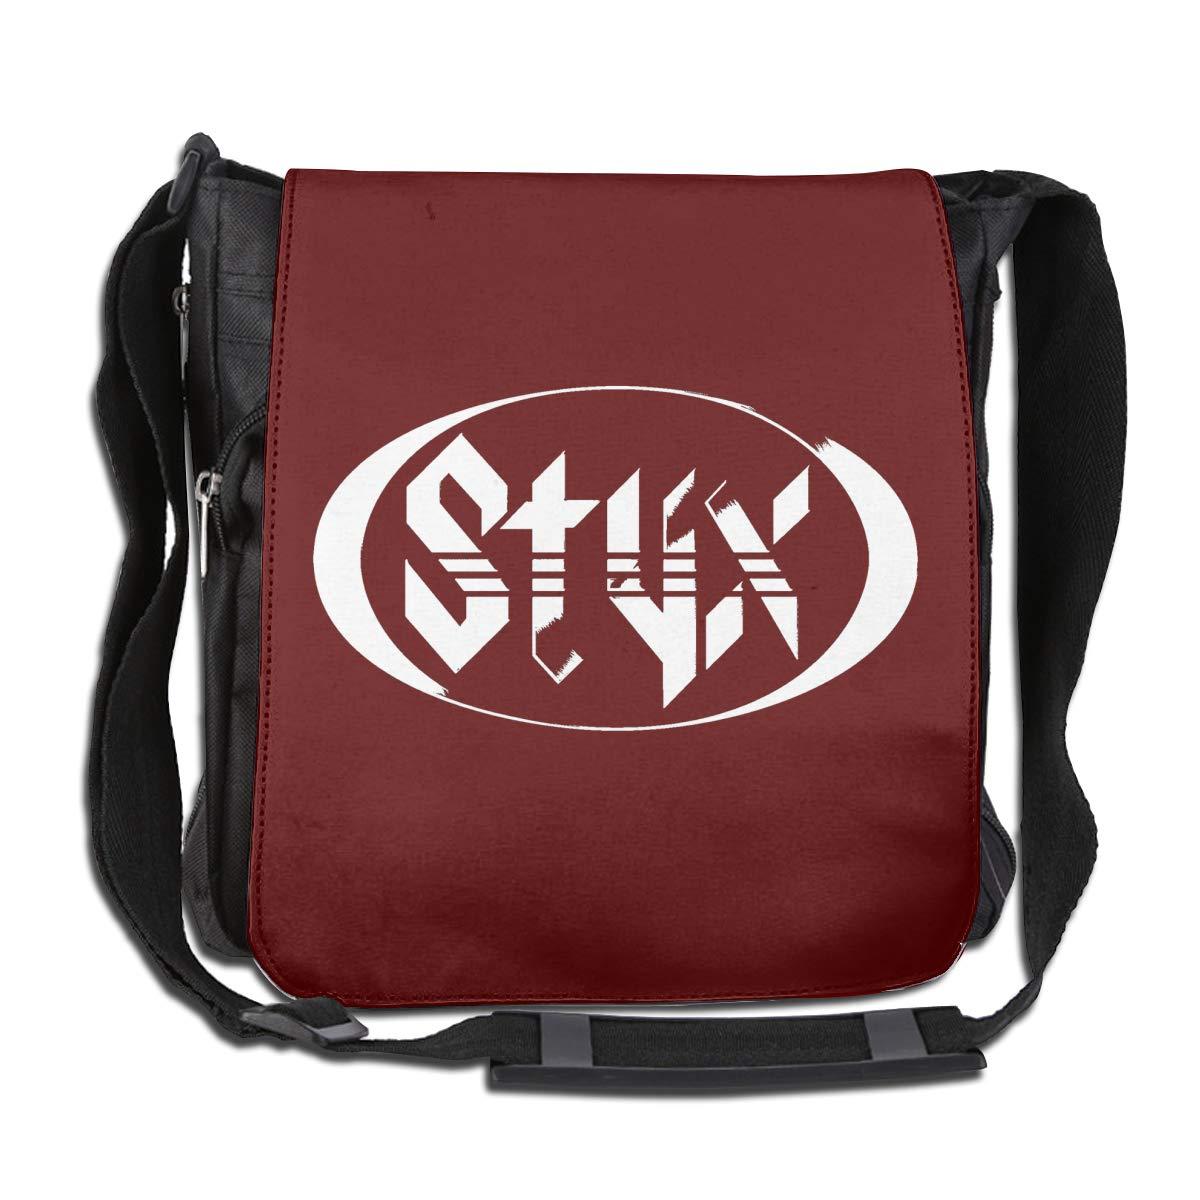 Styx Messenger Bag School Satchel Shoulder Bag Crossbody Bag